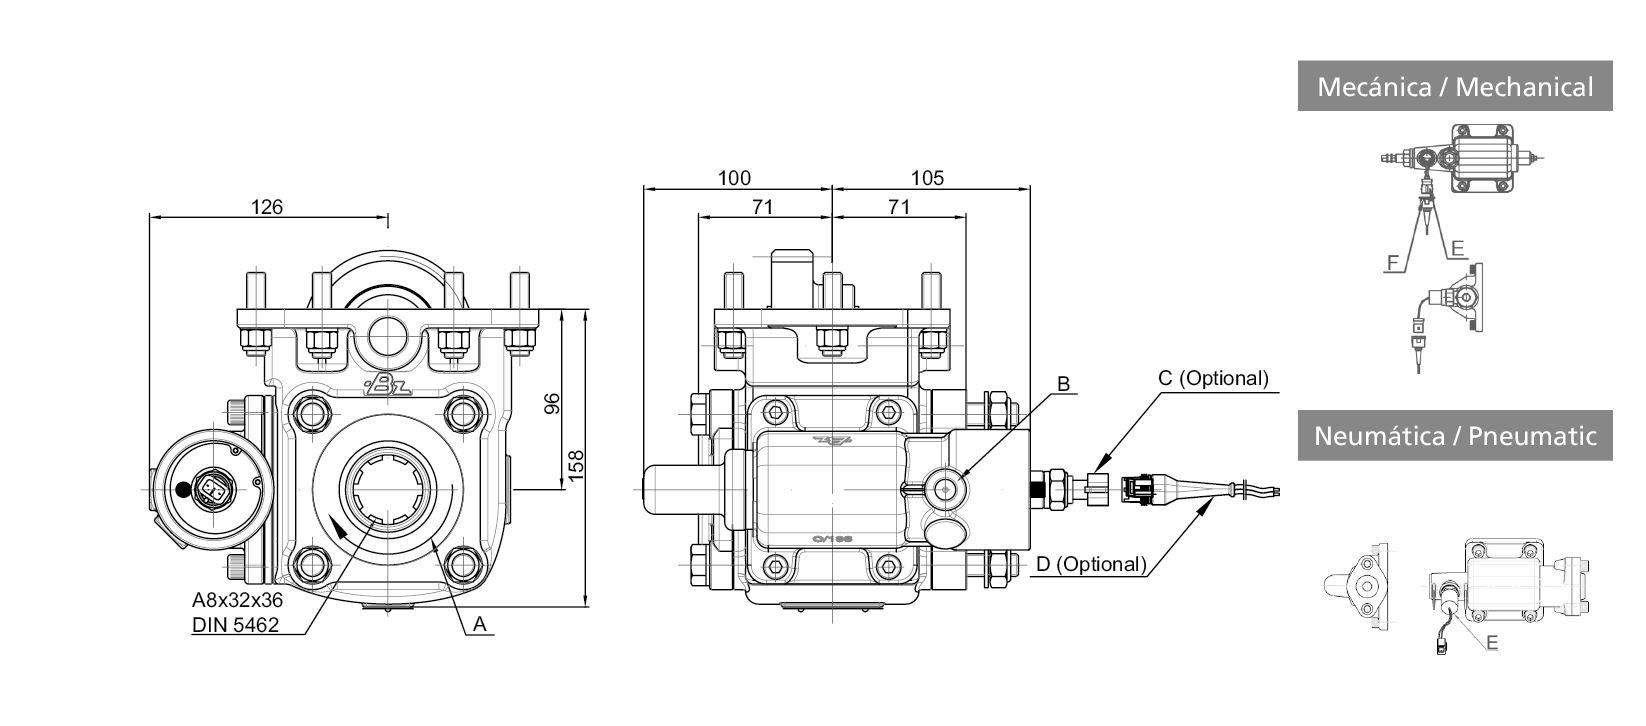 068203 side mount vacuum - single acting